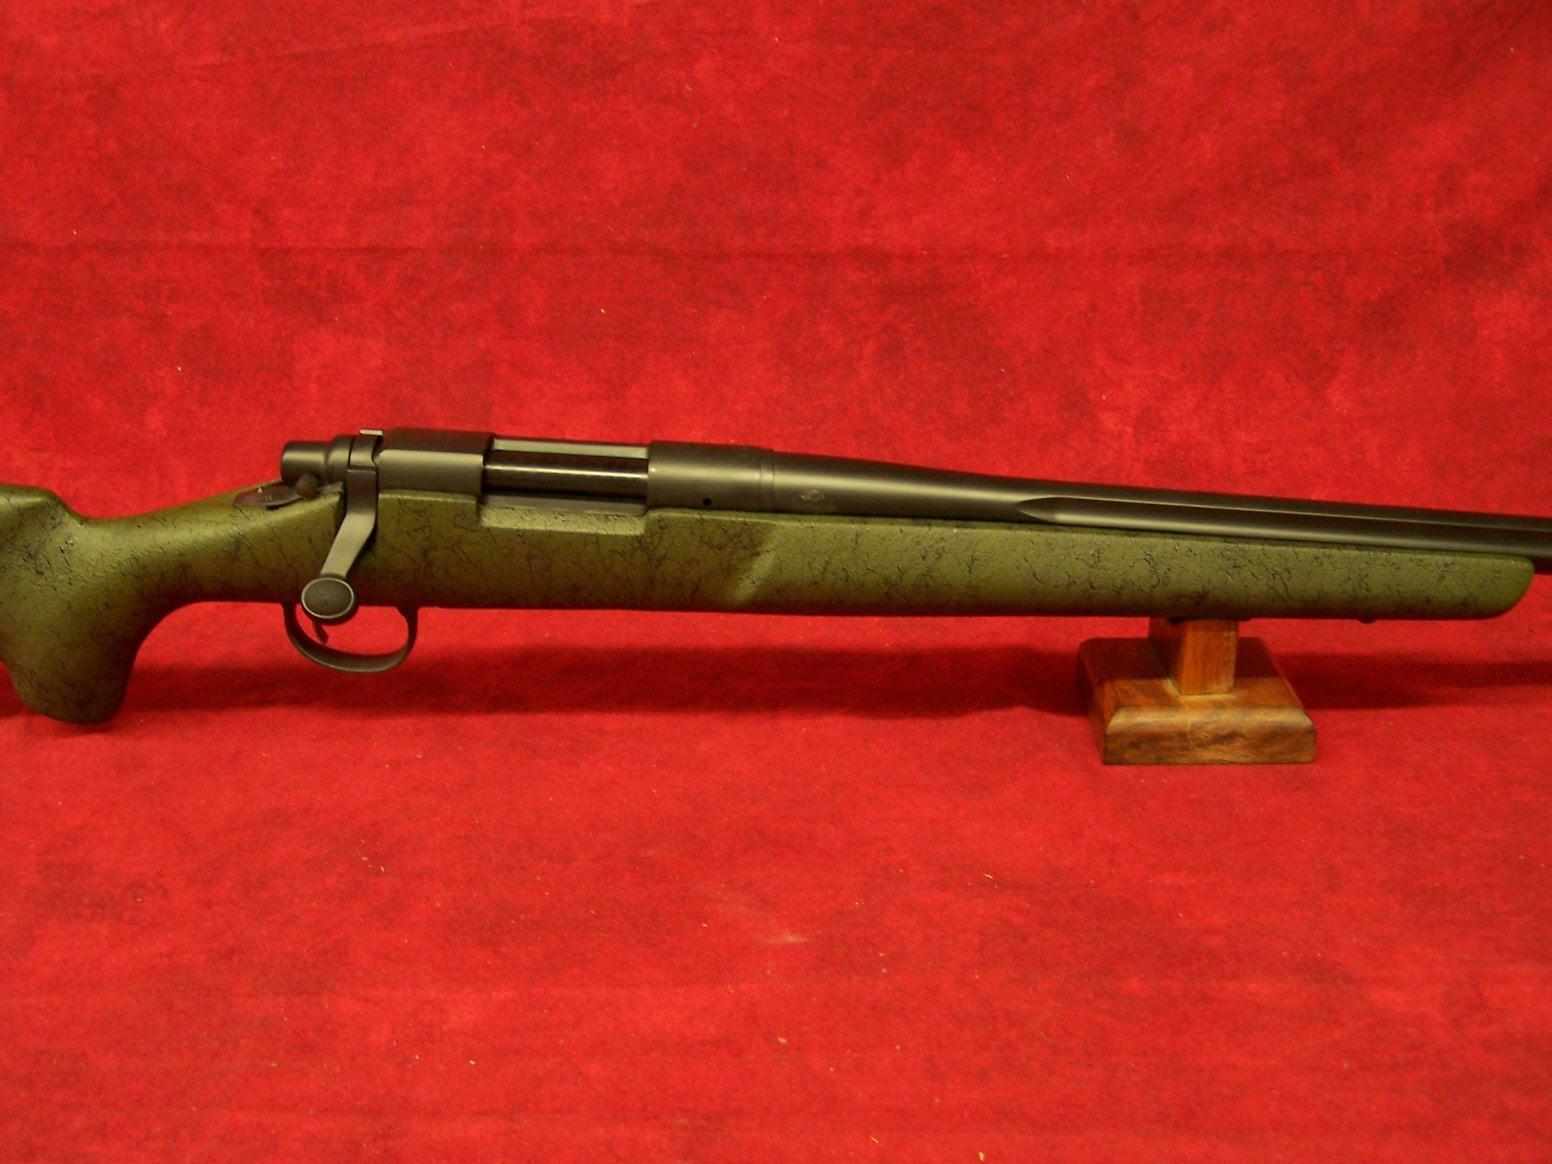 Model 700 XCR II Tactical Long-Range Rifle .223 Remington 26 Inch Stainless (84460)  Guns > Rifles > Remington Rifles - Modern > Model 700 > Tactical